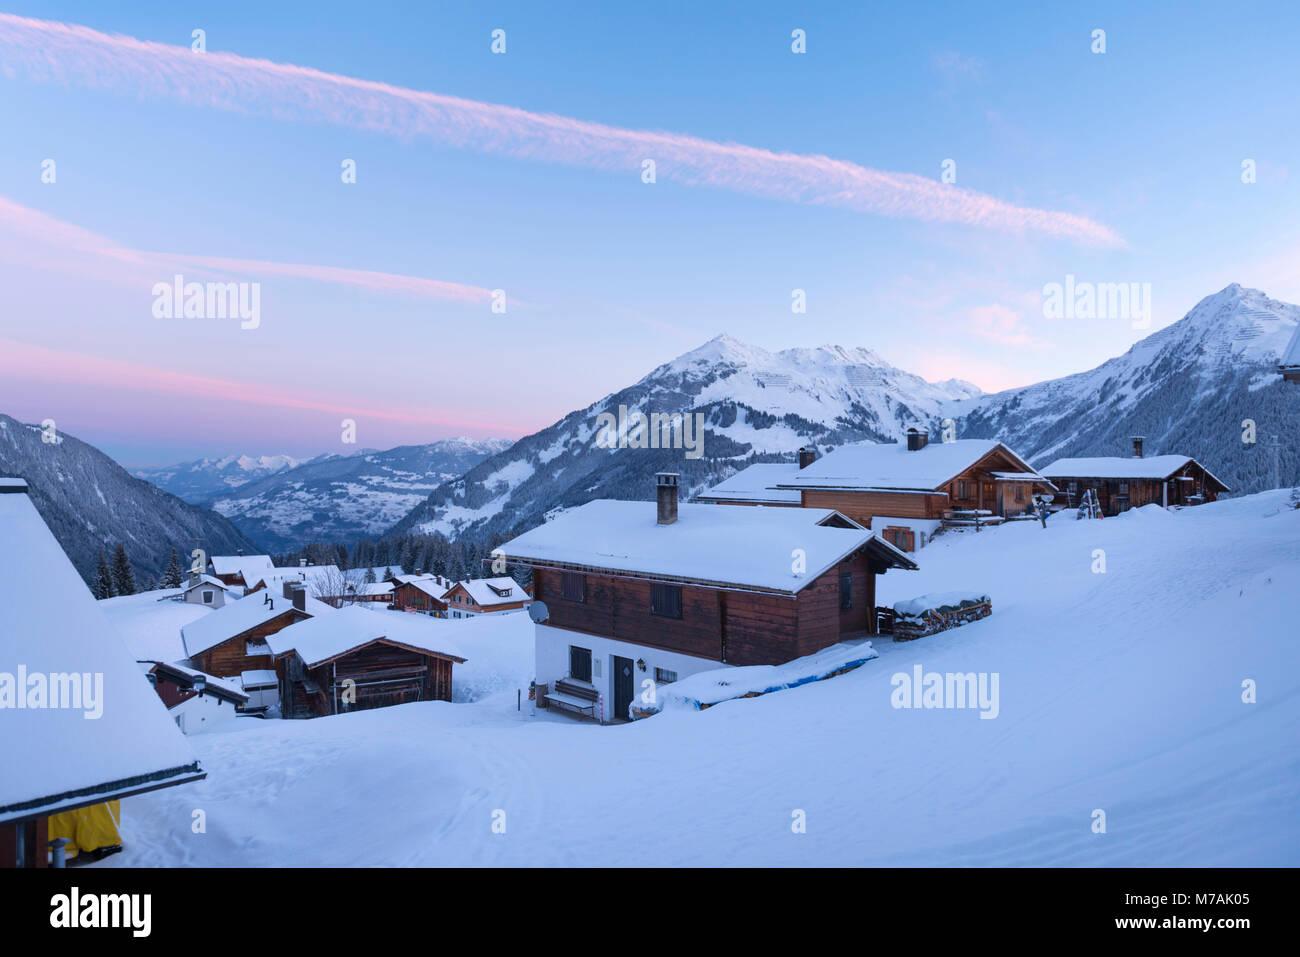 Austria, Montafon, Garfrescha, morning hour in Garfrescha, a village made of huts. - Stock Image